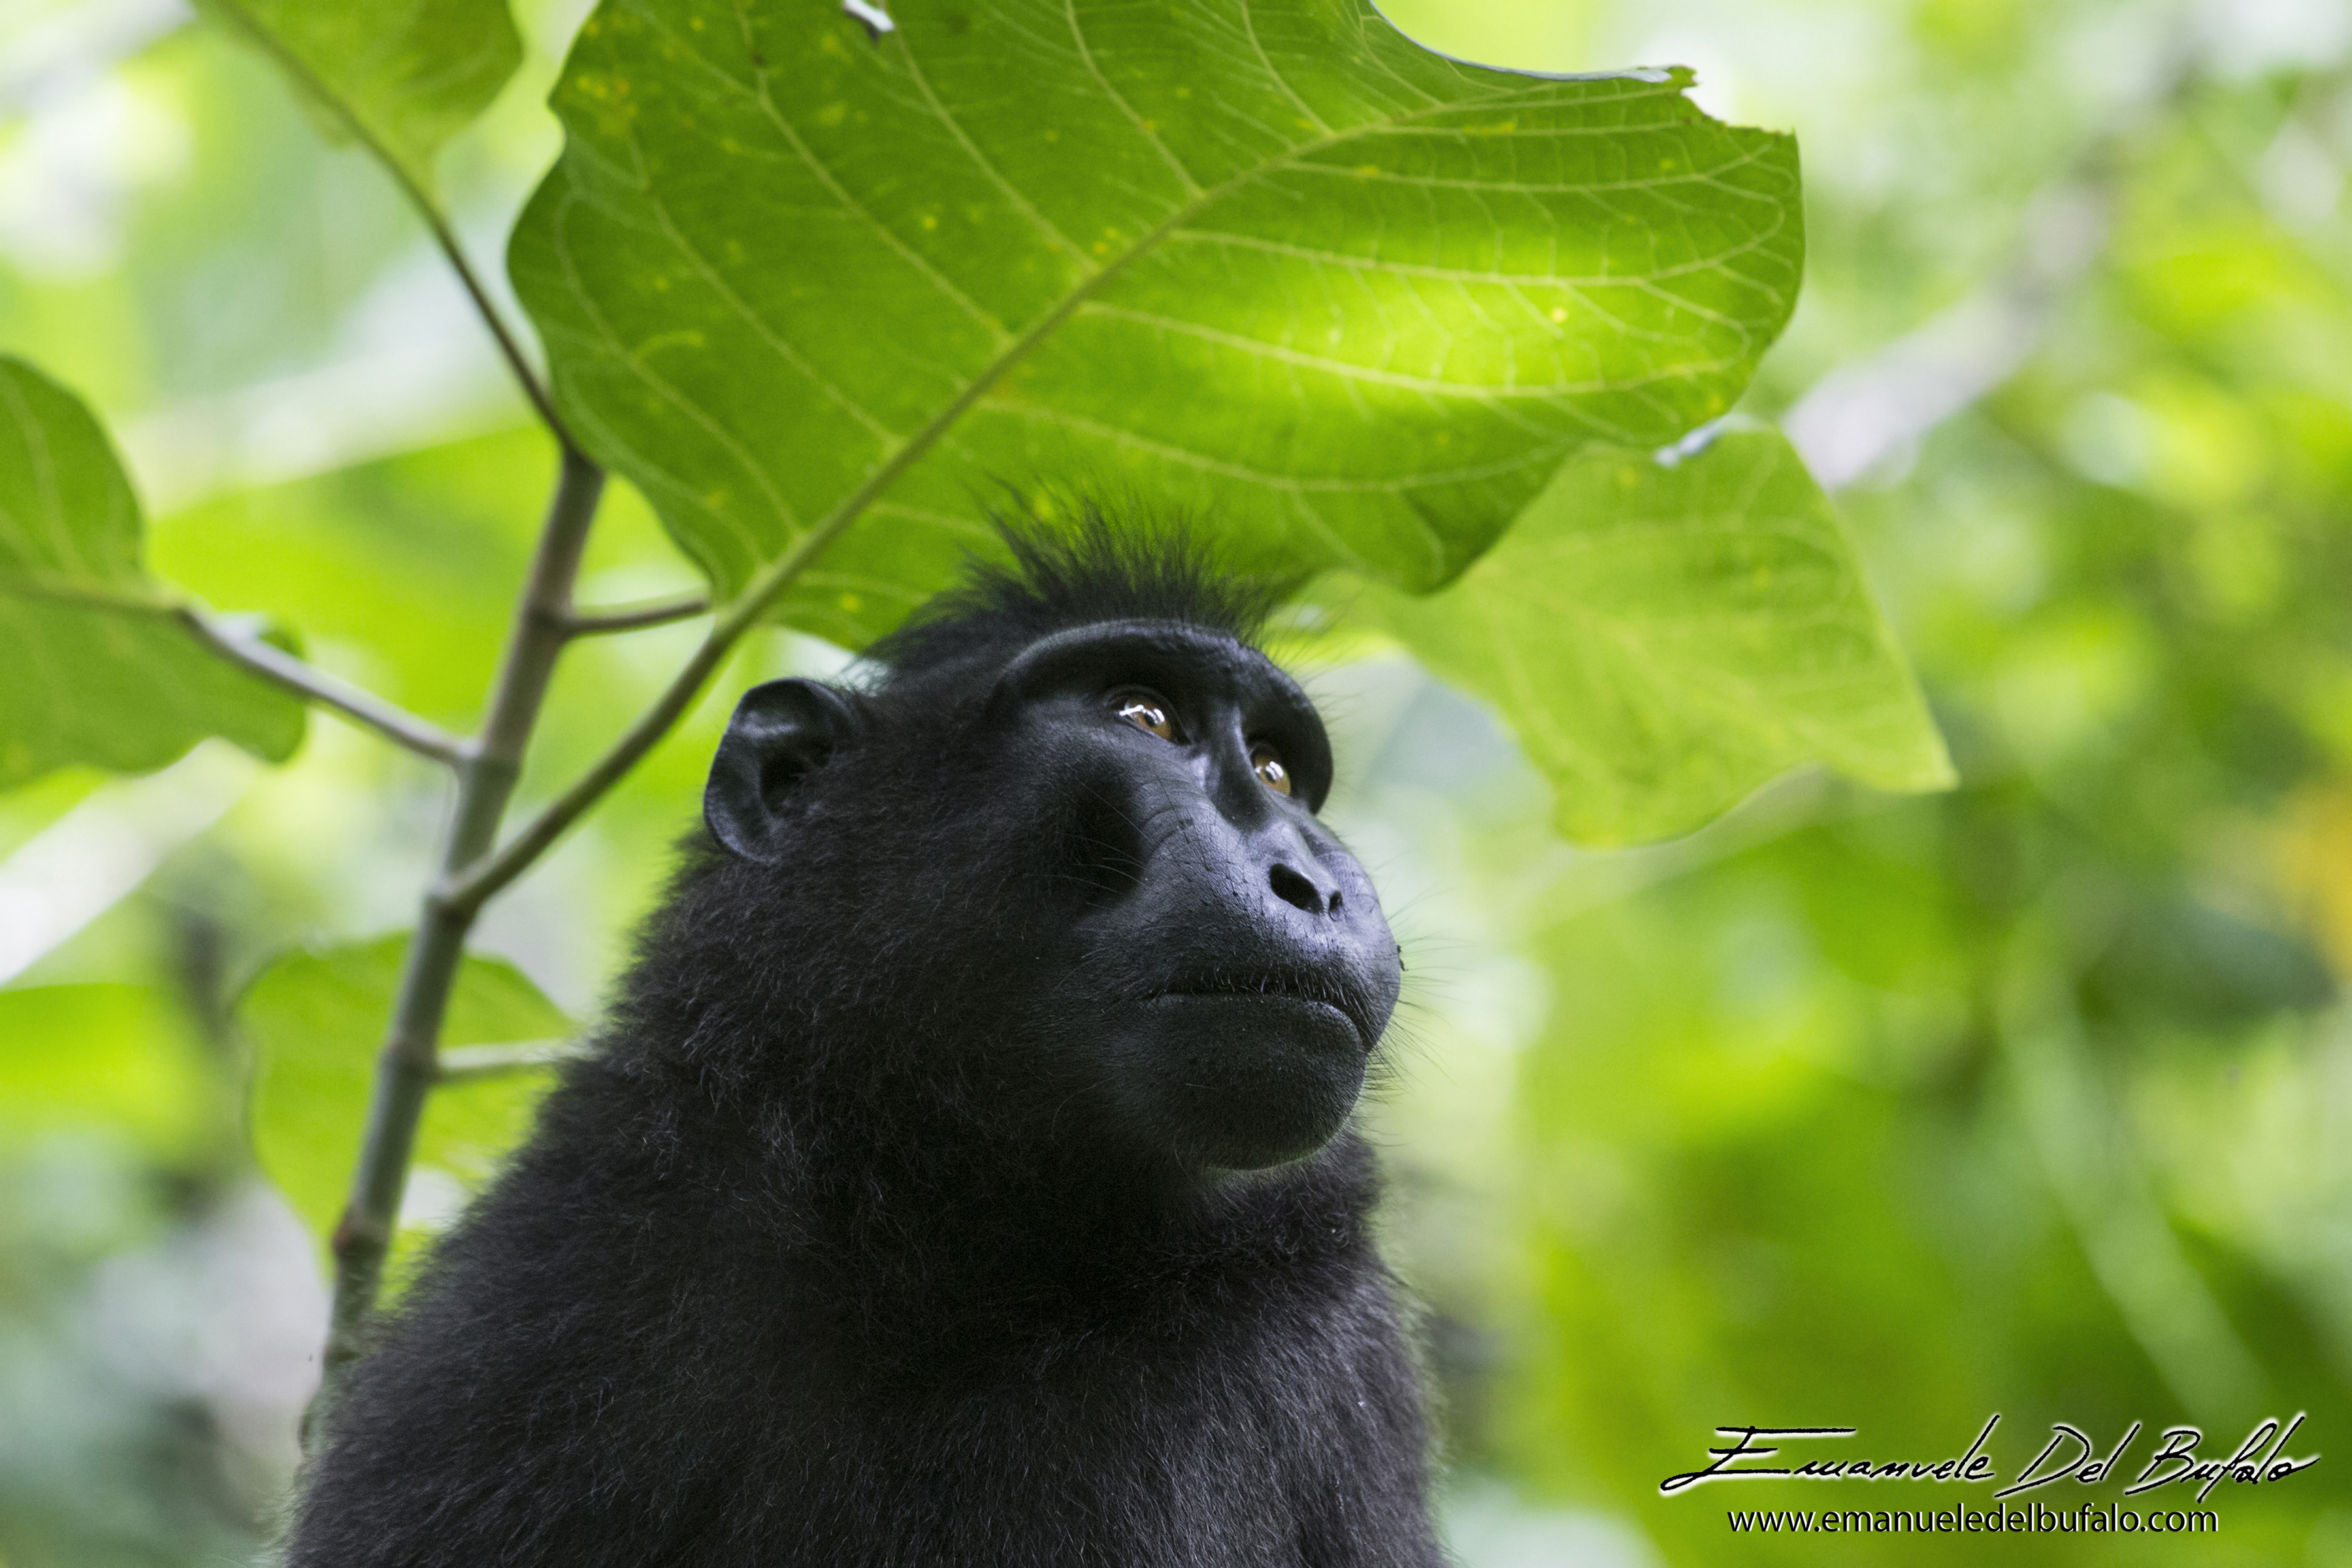 emanueledelbufalo.com #macaque #black #sulawesi #national #park